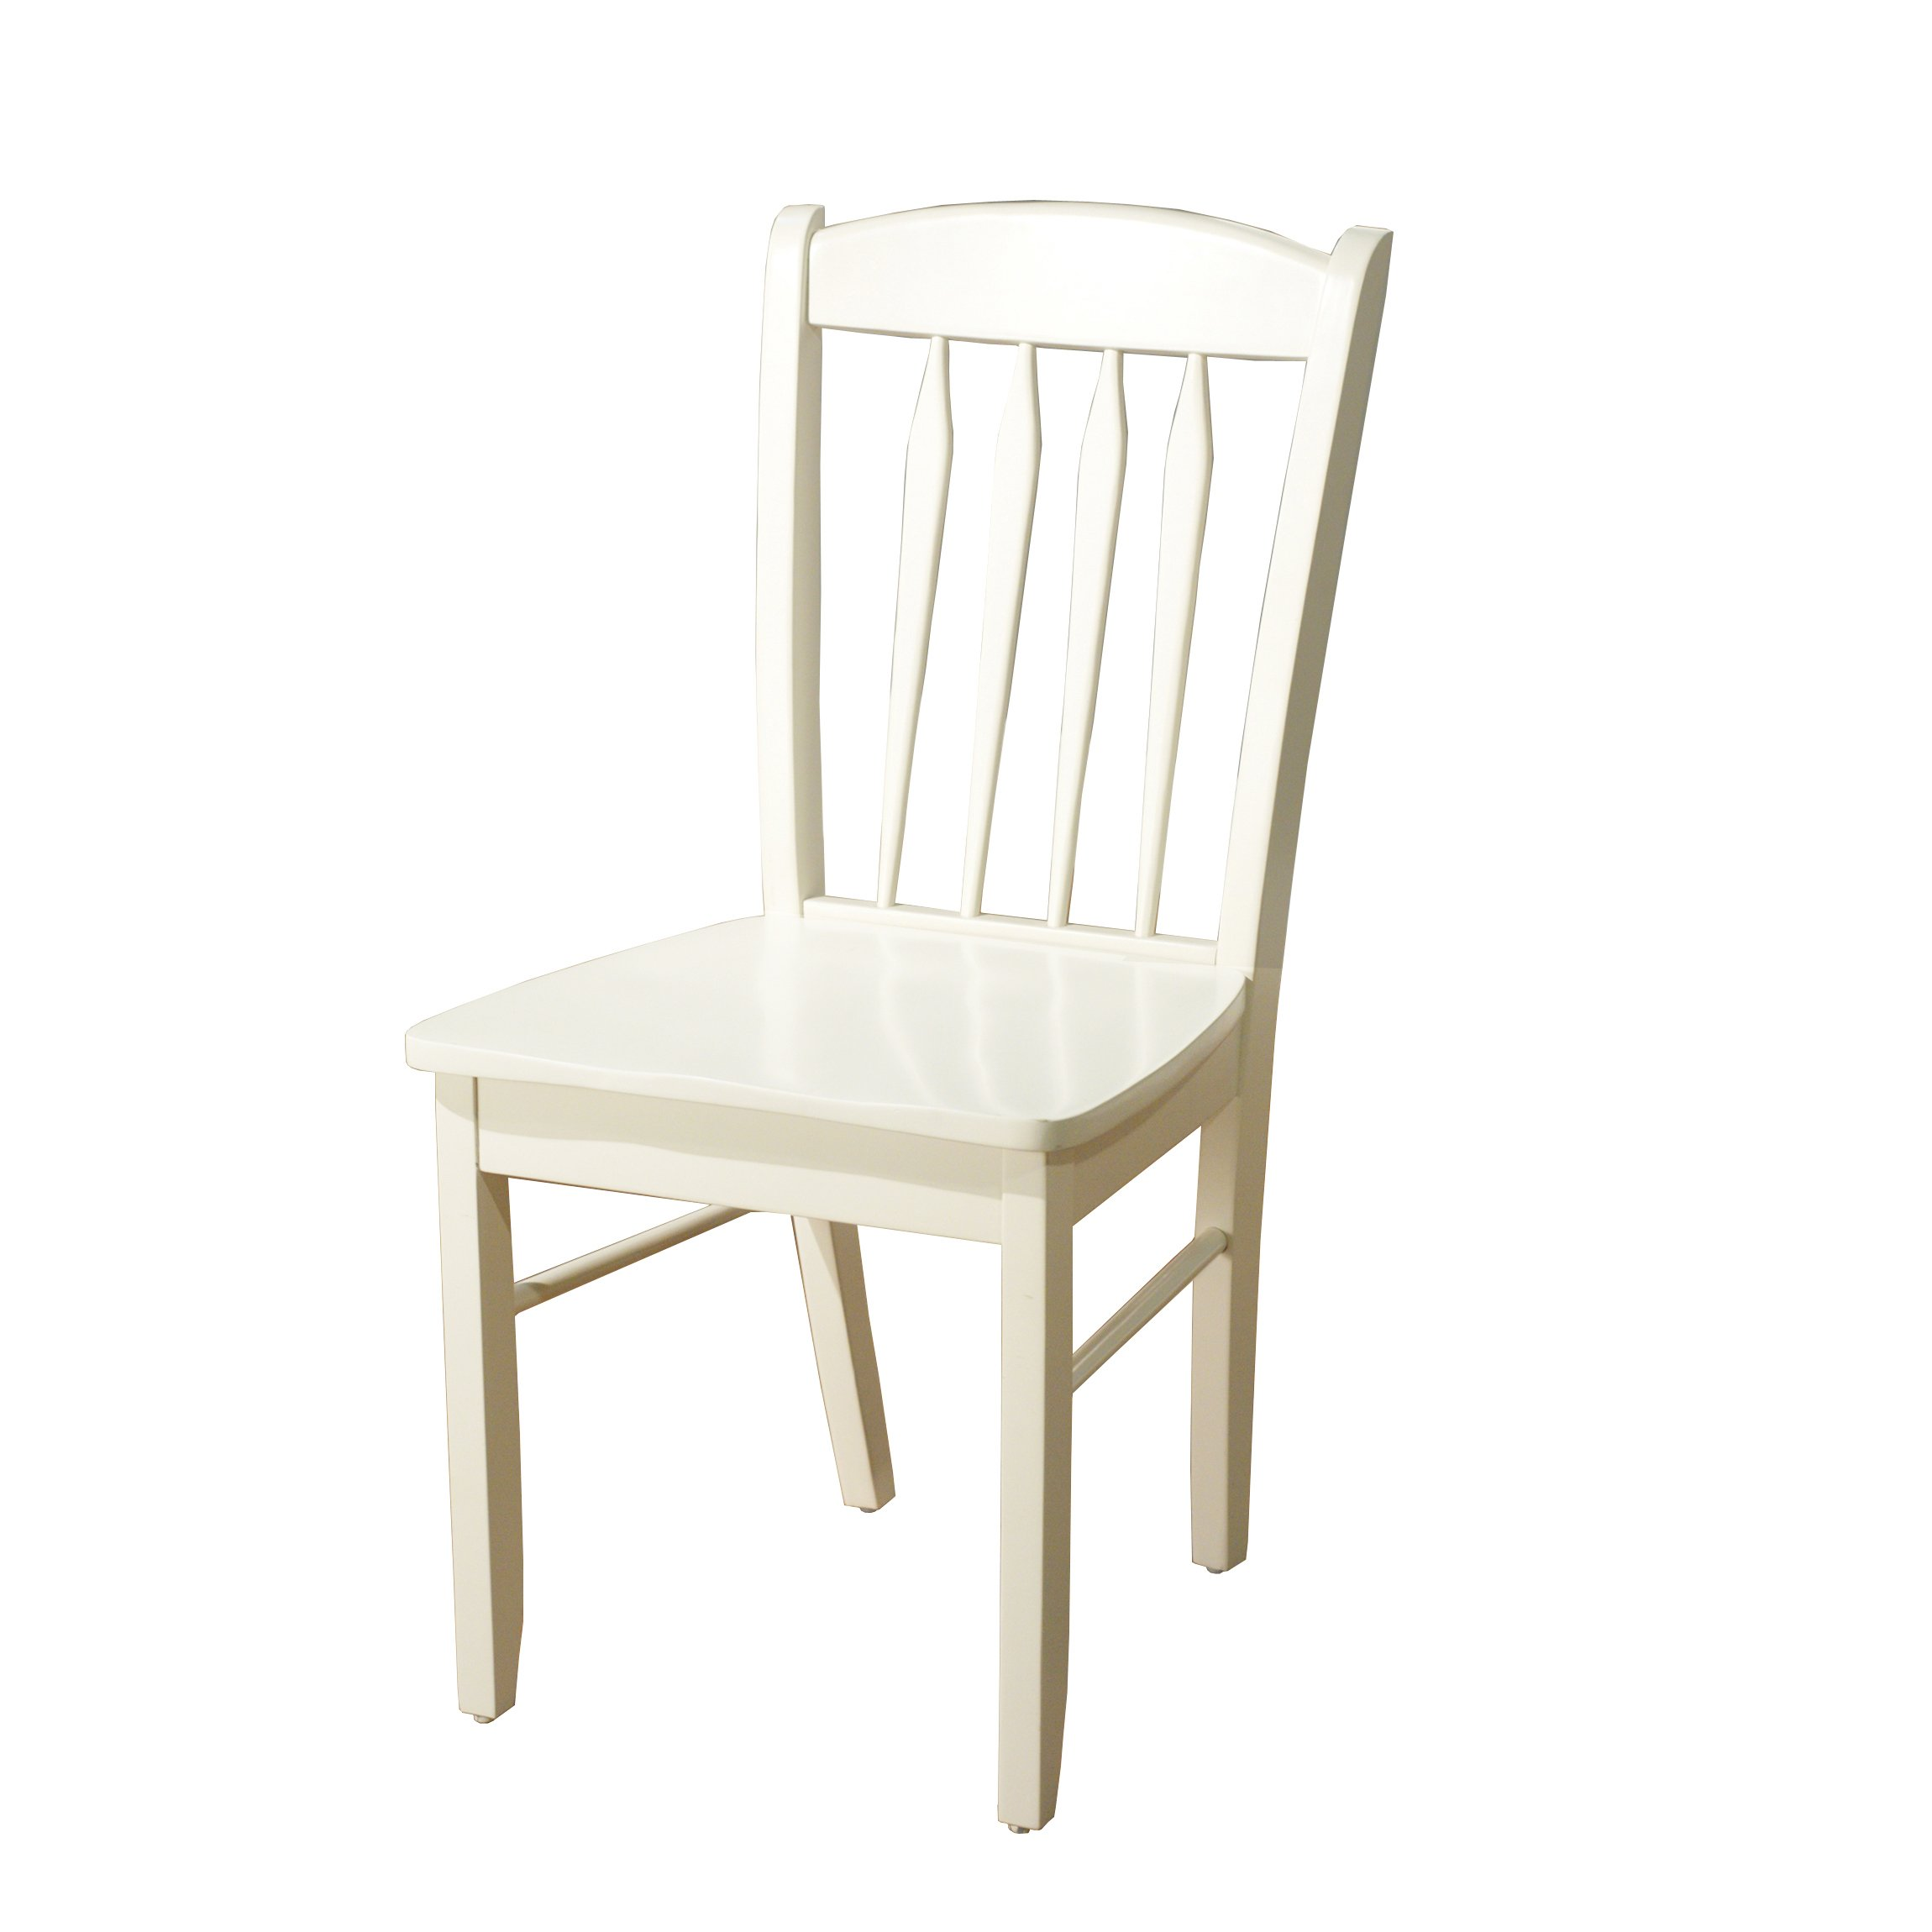 Target Marketing Systems 33418WHT Savannah Dining Chair, White by Target Marketing Systems